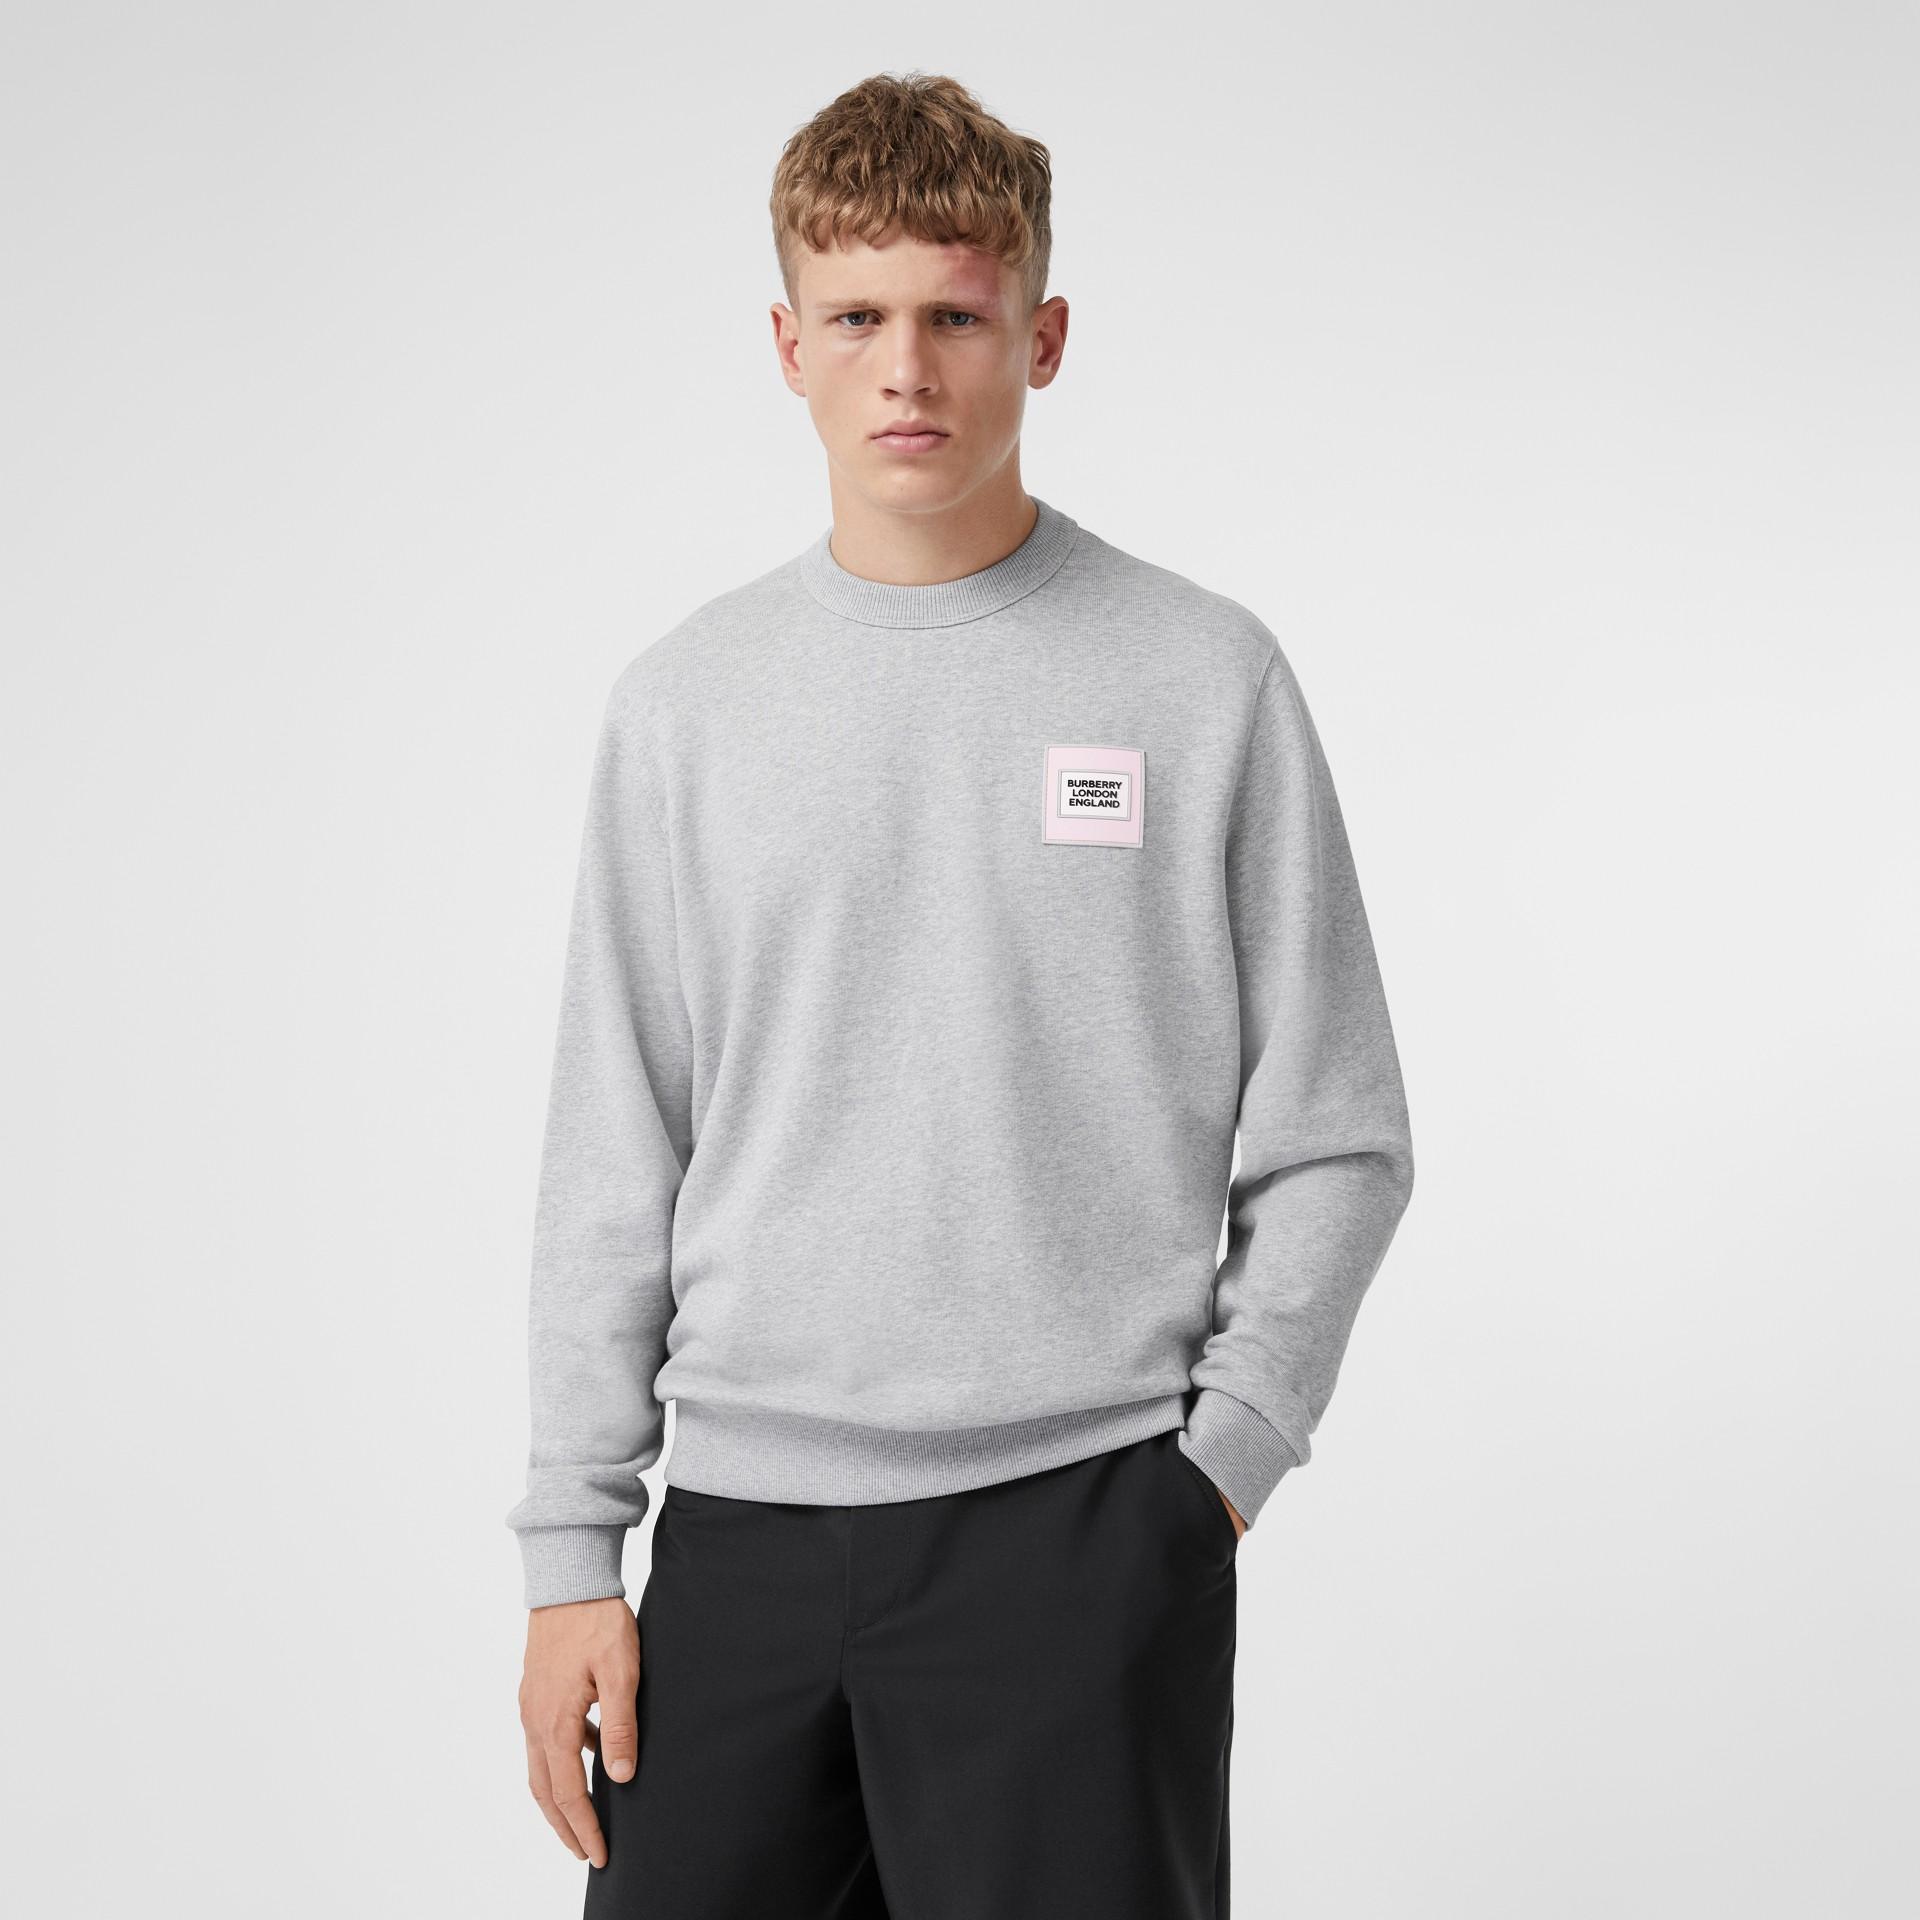 Logo Appliqué Cotton Sweatshirt in Pale Grey Melange - Men | Burberry United Kingdom - gallery image 0